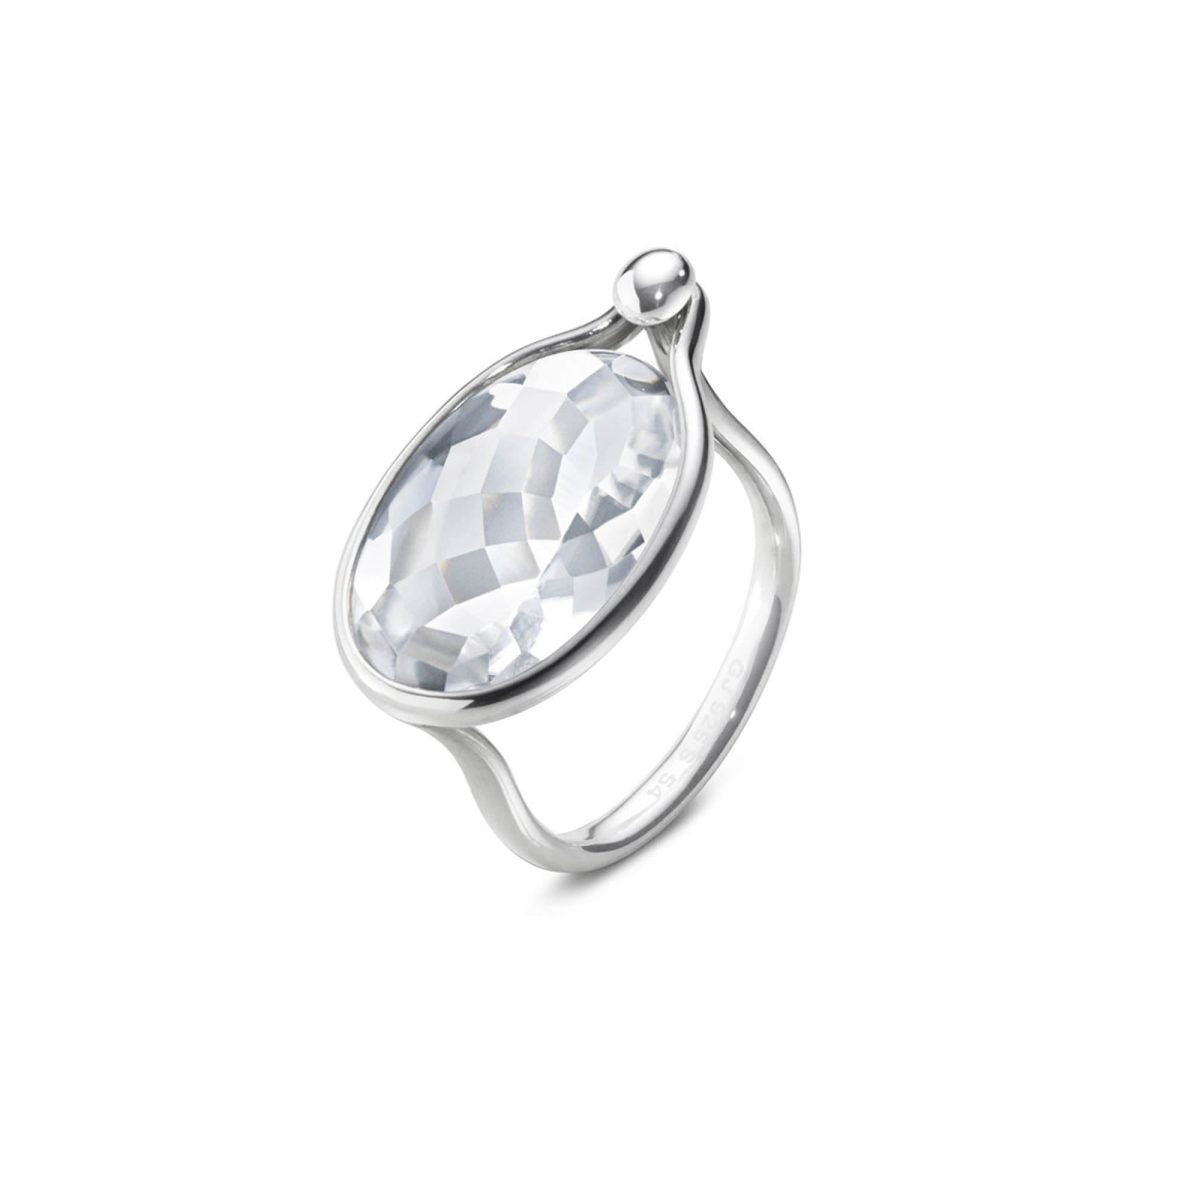 Georg Jensen Savannah Ring